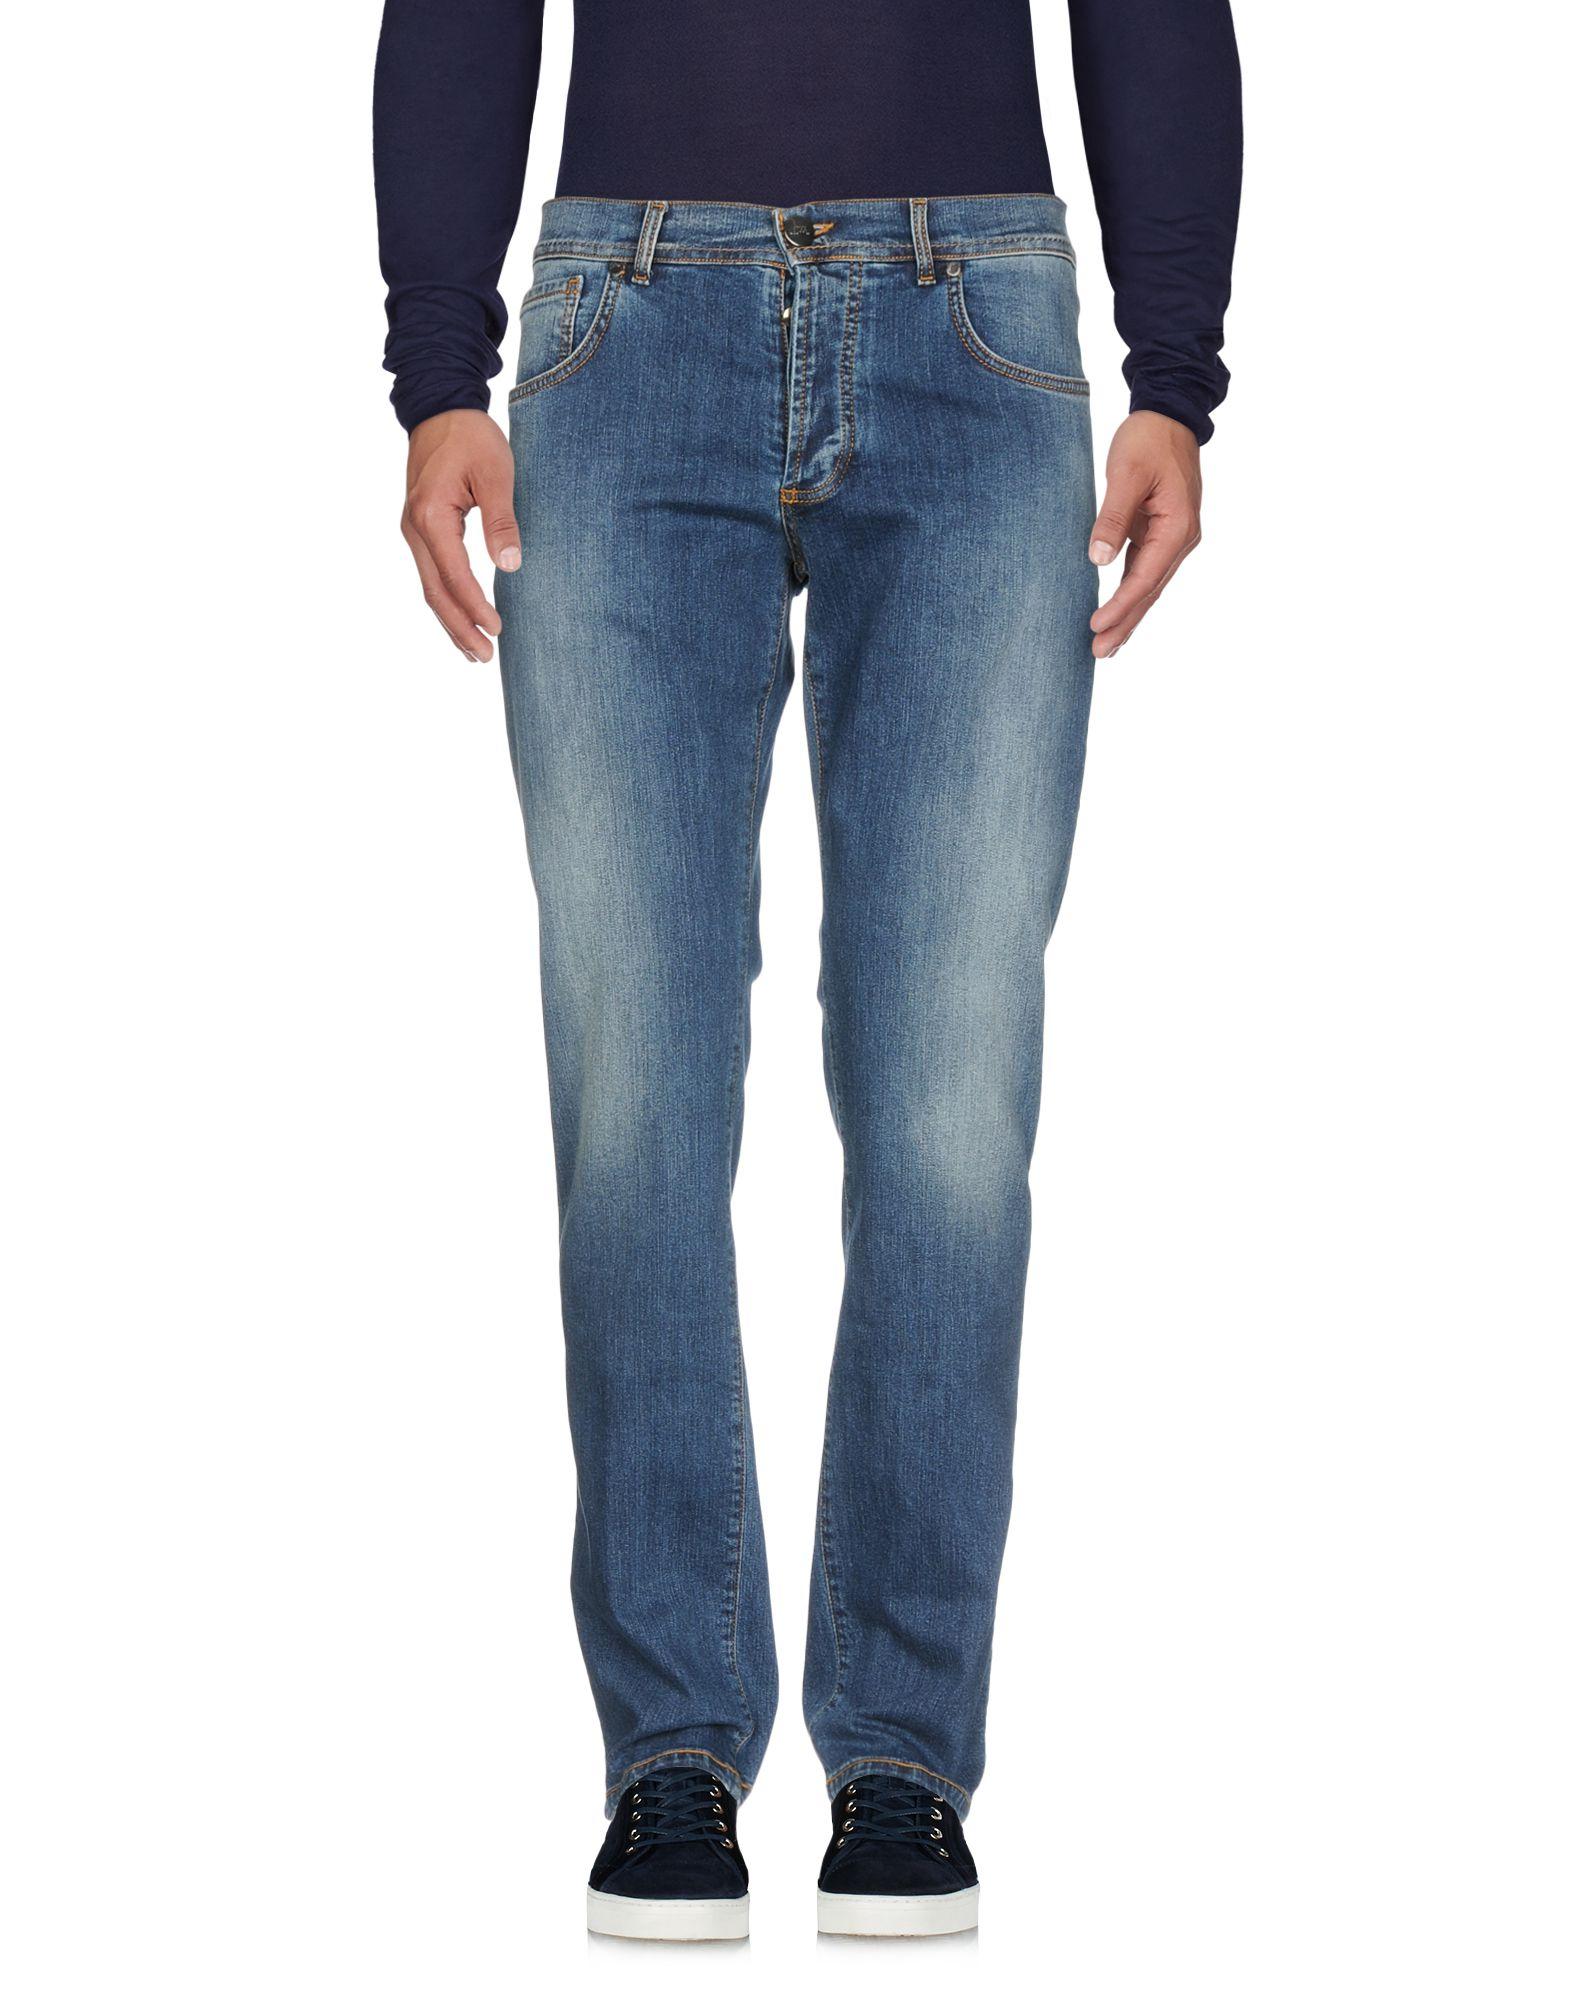 Pantaloni Jeans Moorer Donna - Acquista online su